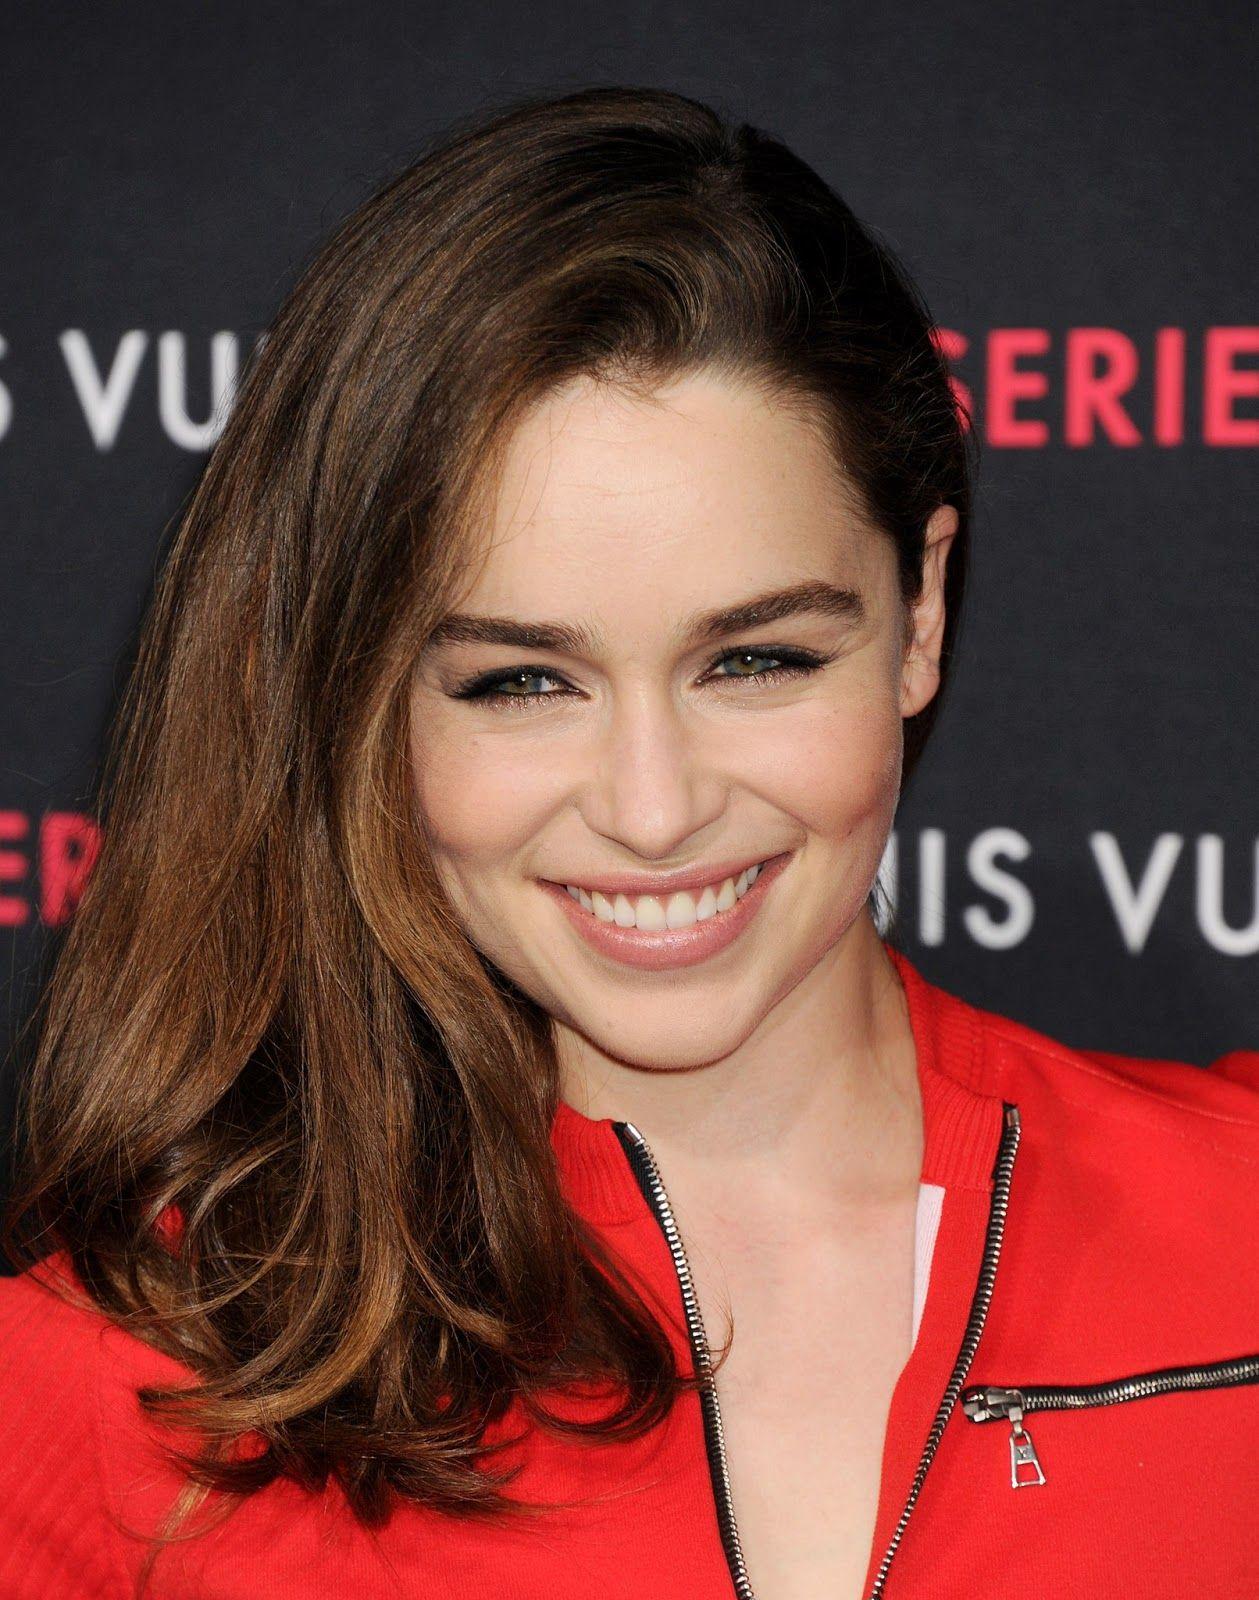 Terminator Genisys Actress Emilia Clarke Full HD Images ...